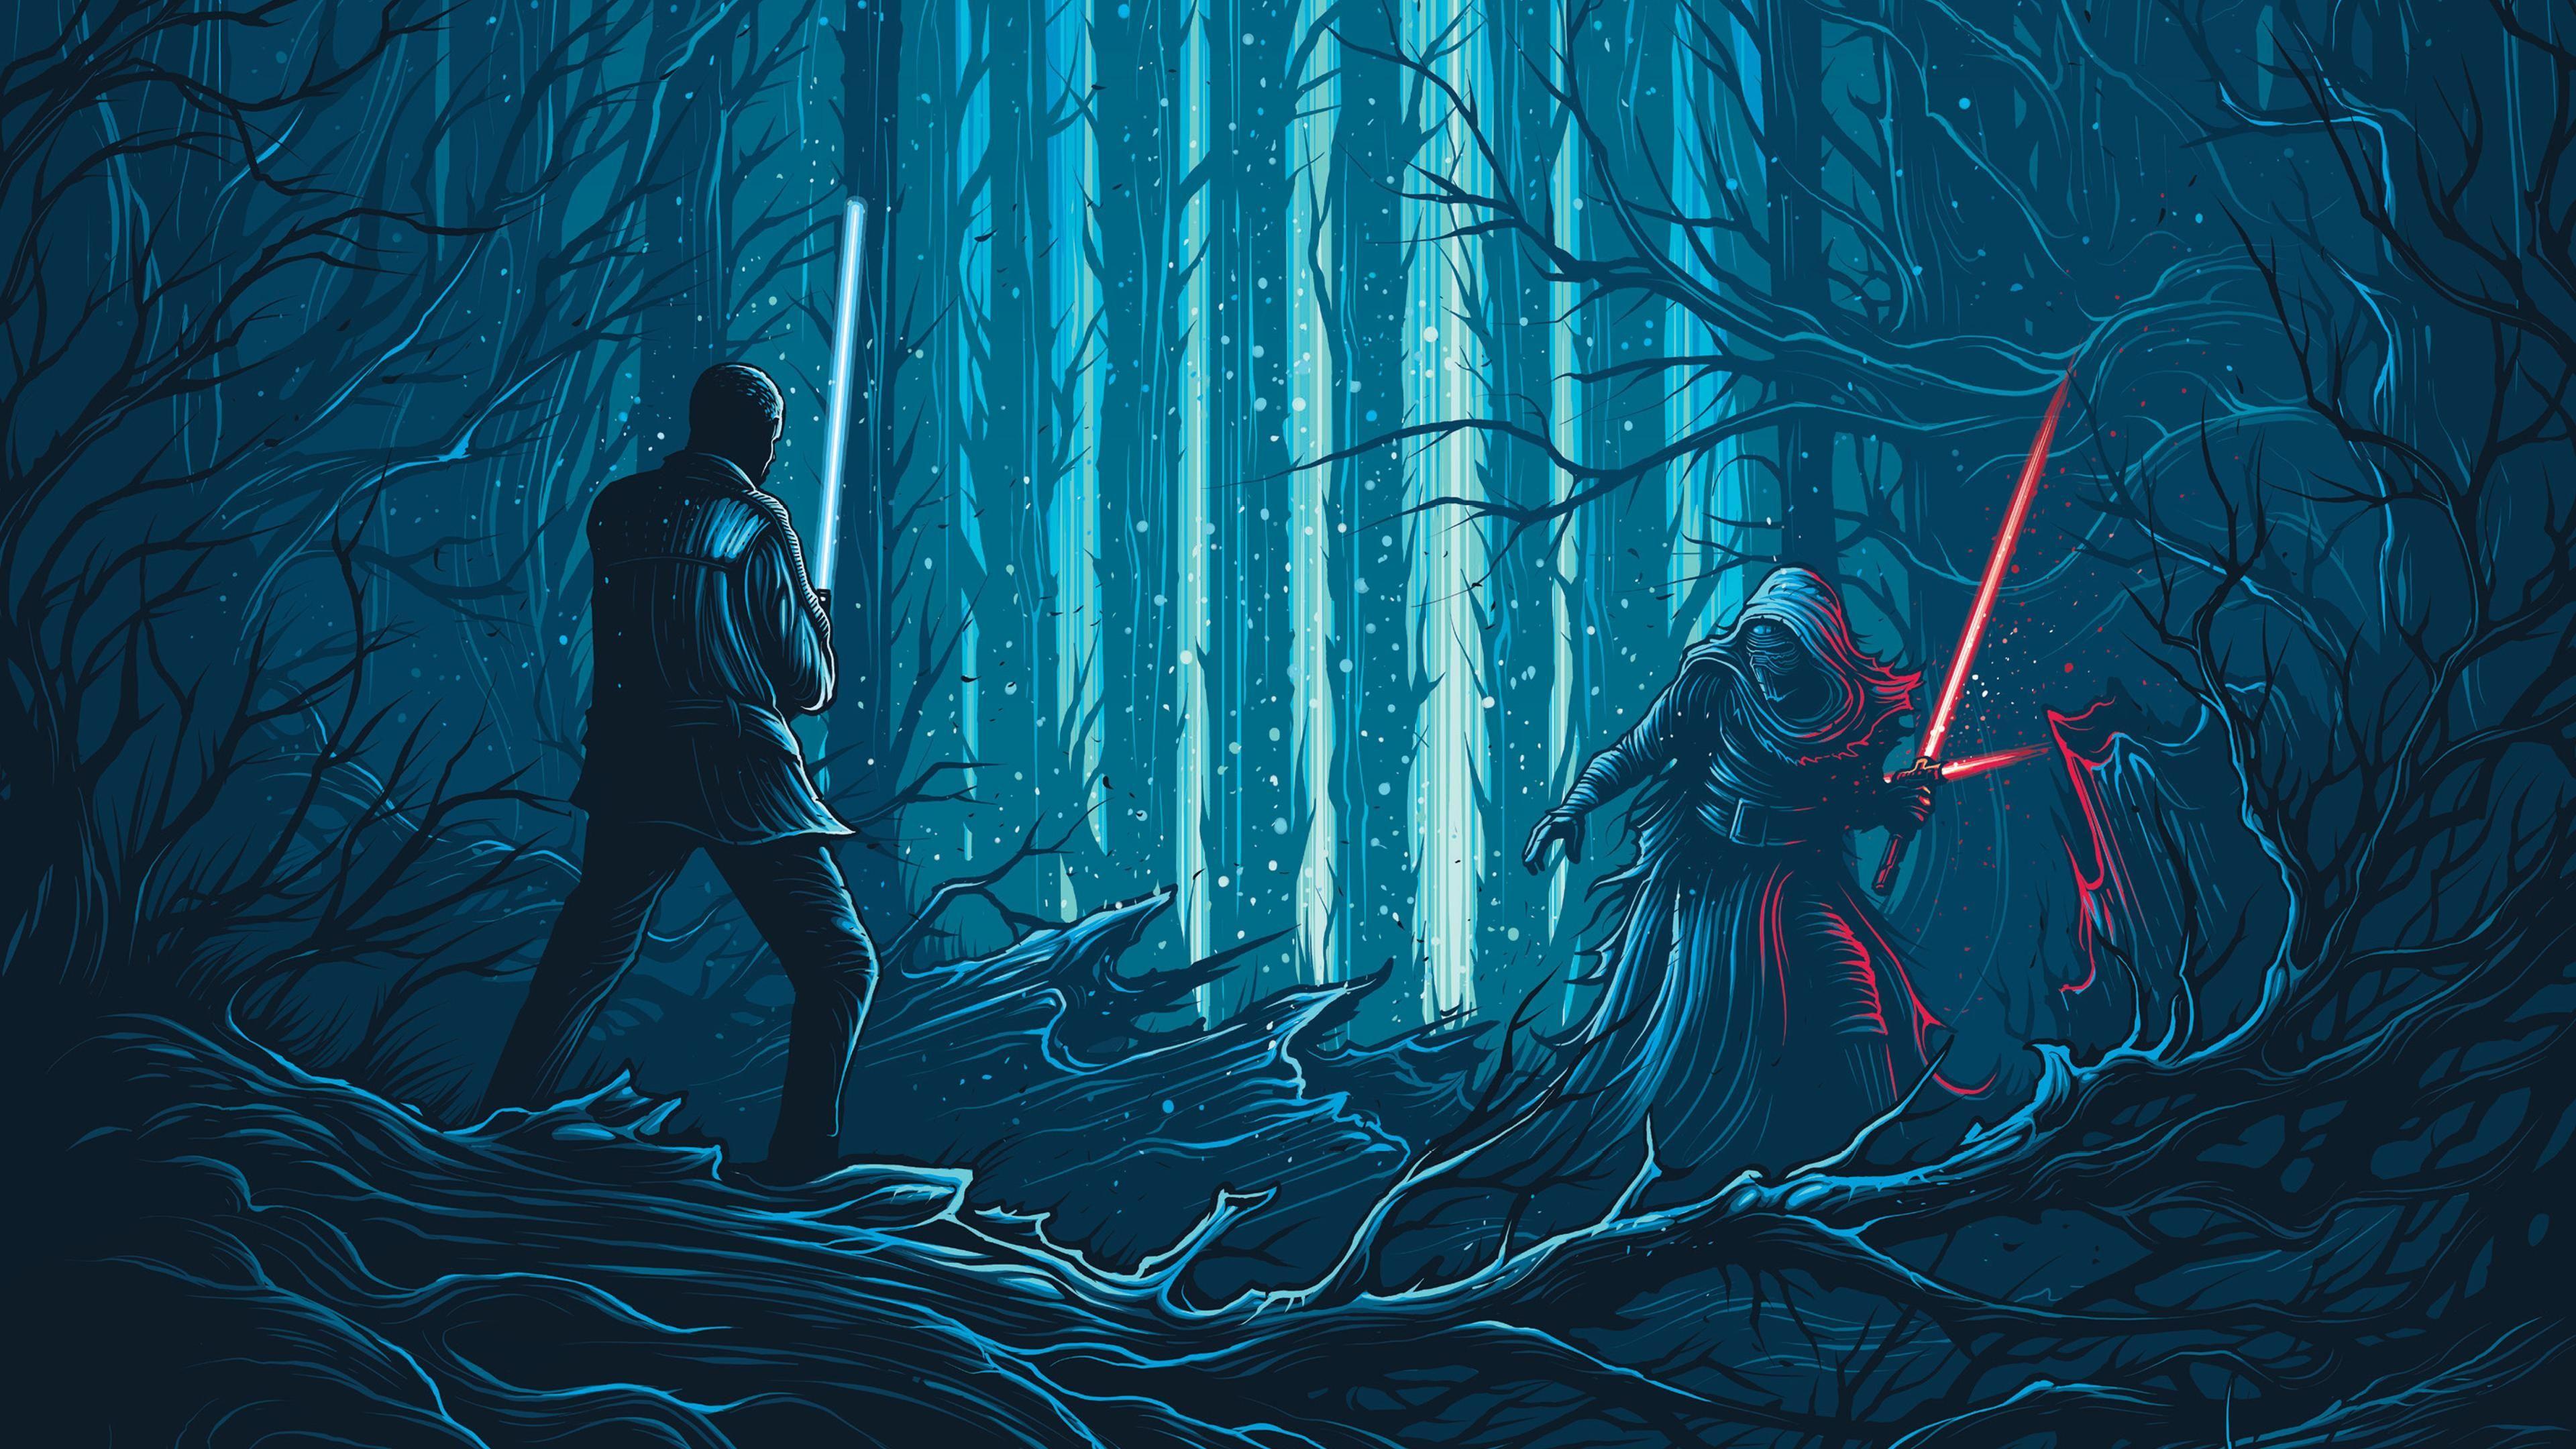 Blue Star Wars Desktop 4k Wallpapers Wallpaper Cave